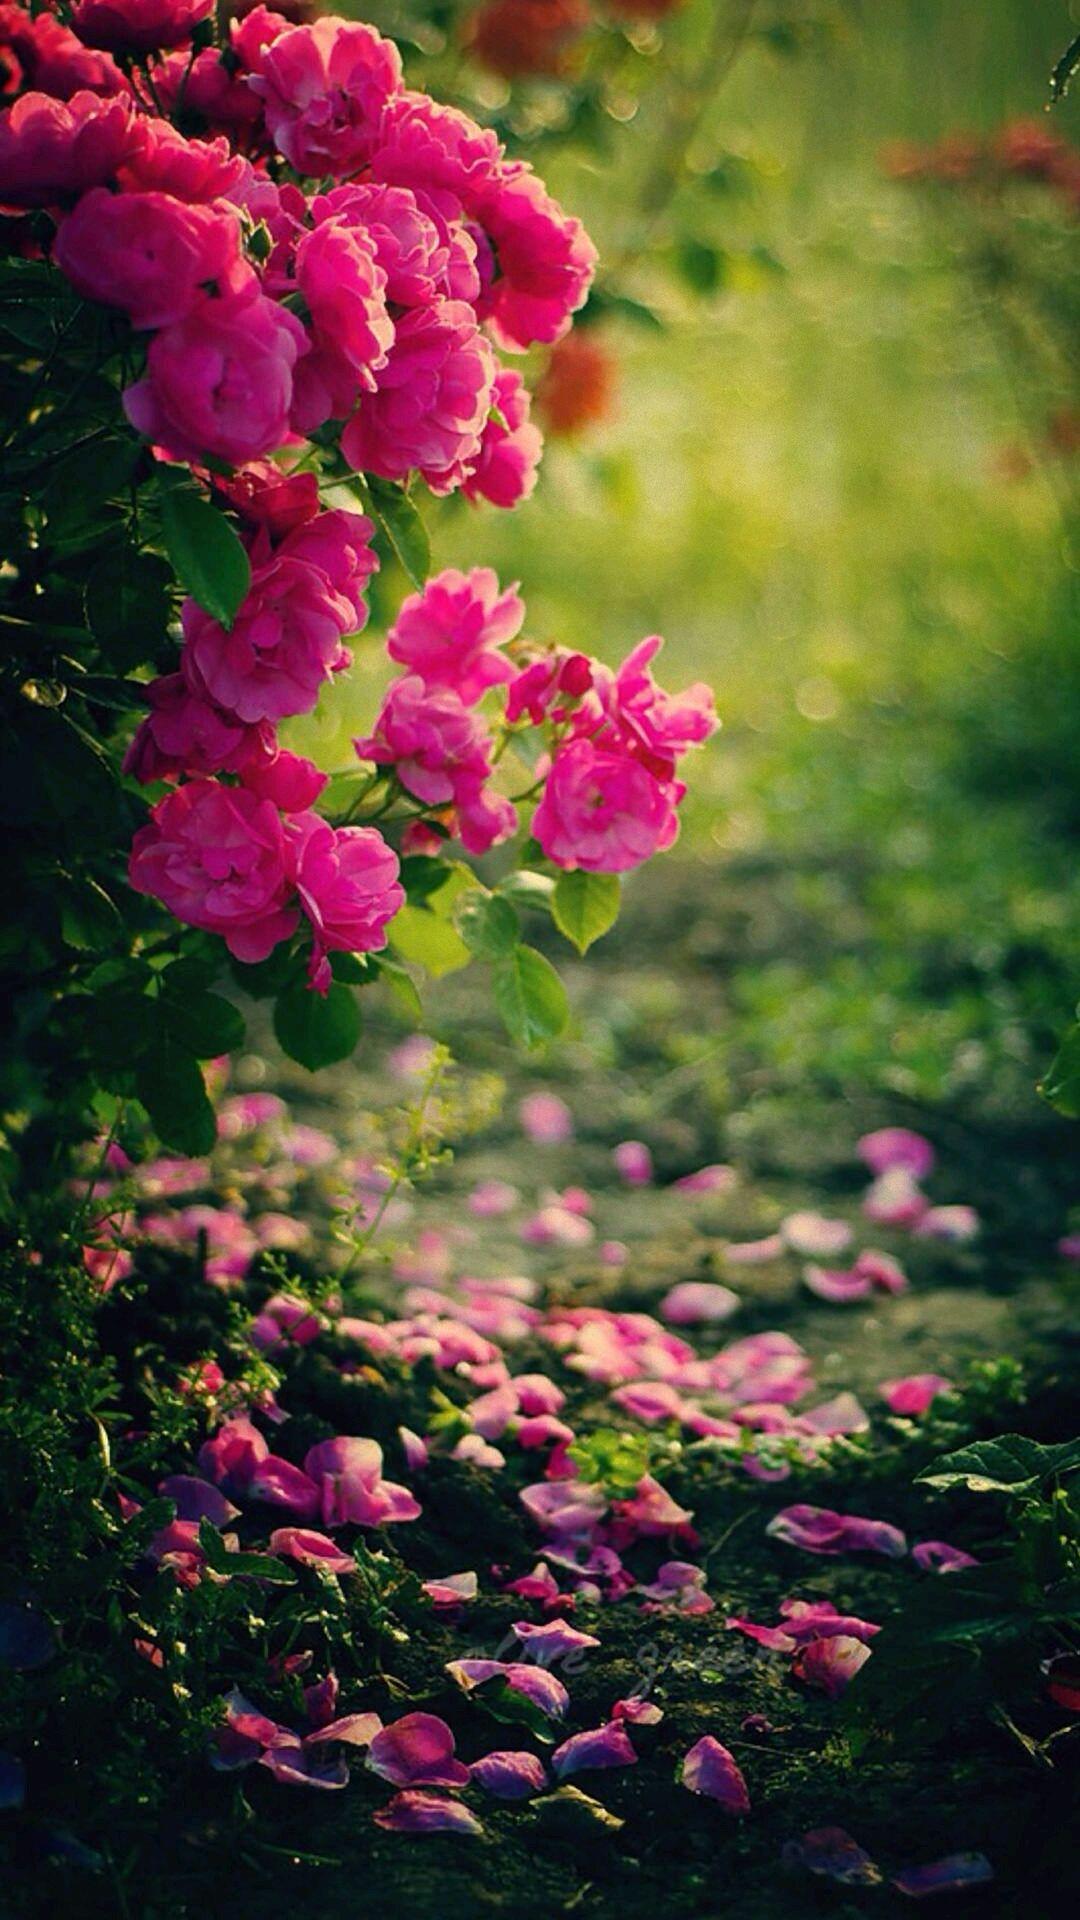 Pink Roses Flowers Mobile Wallpaper Nature Photography Flowers Wallpaper Nature Flowers Hd Nature Wallpapers Flower wallpaper hd mobile